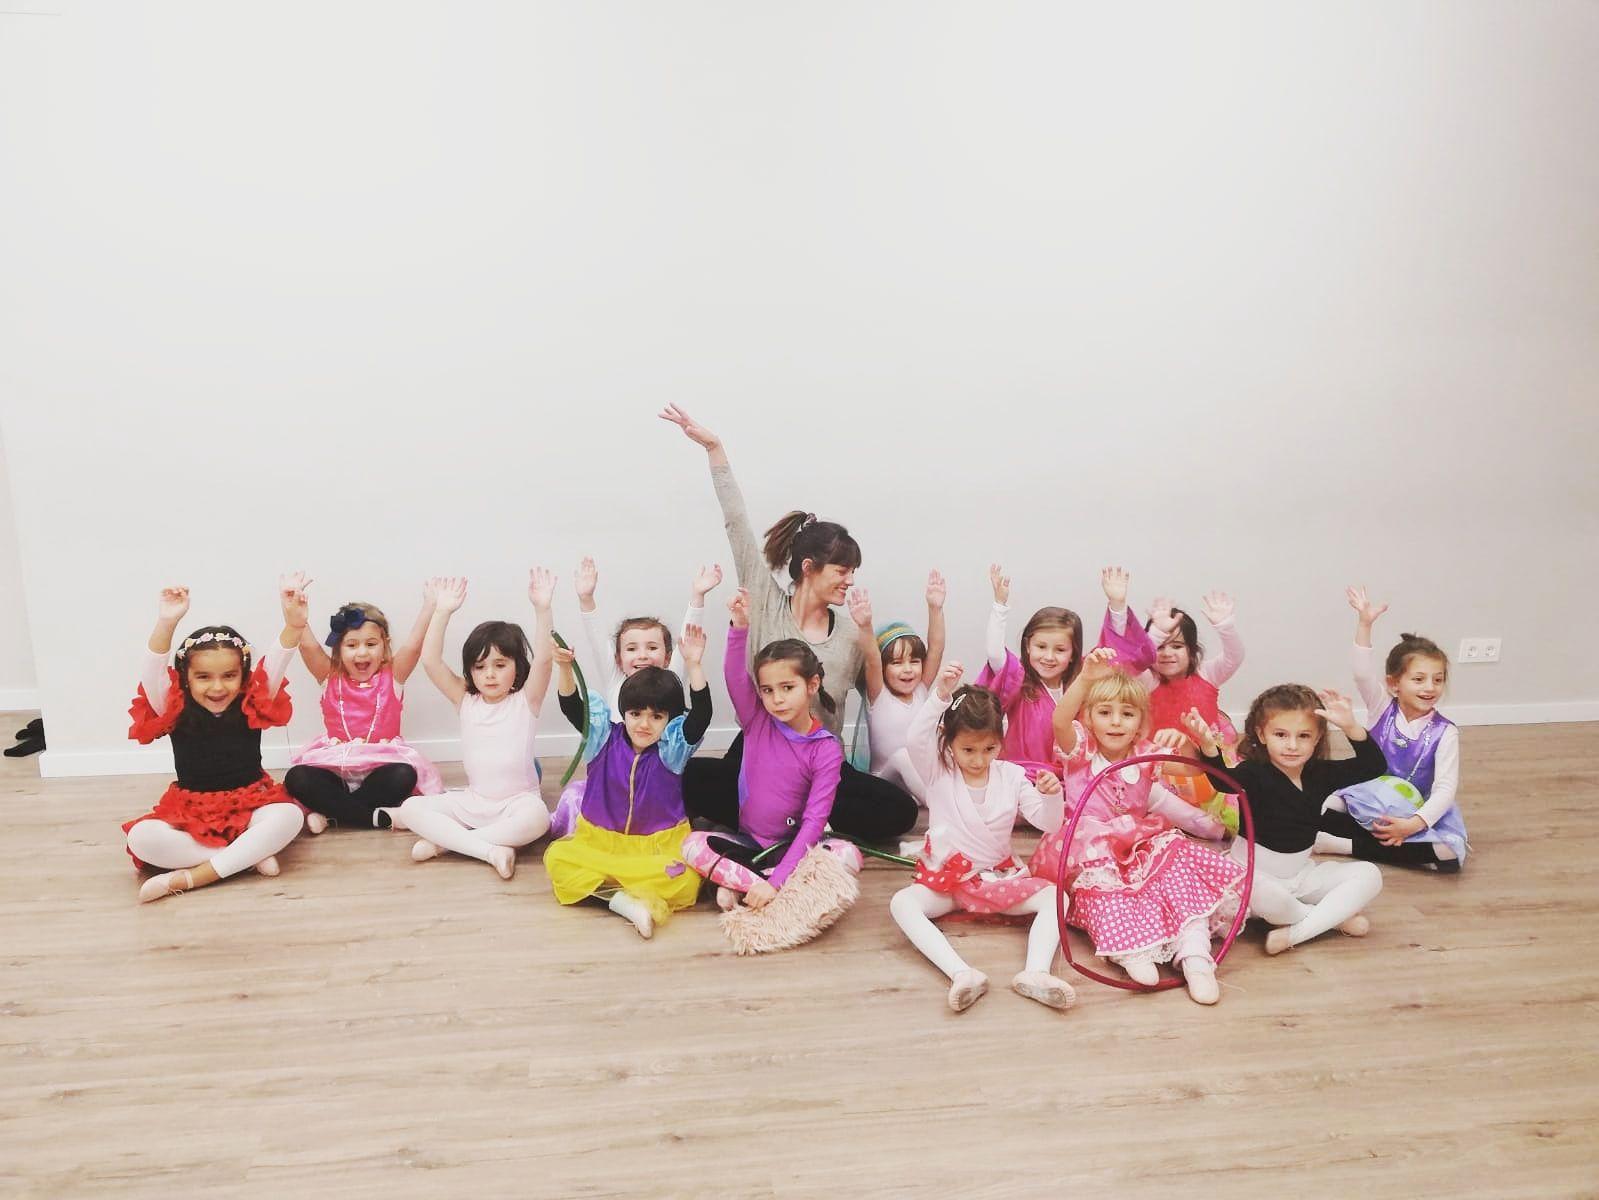 Escuela de danza para todas las edades Getxo